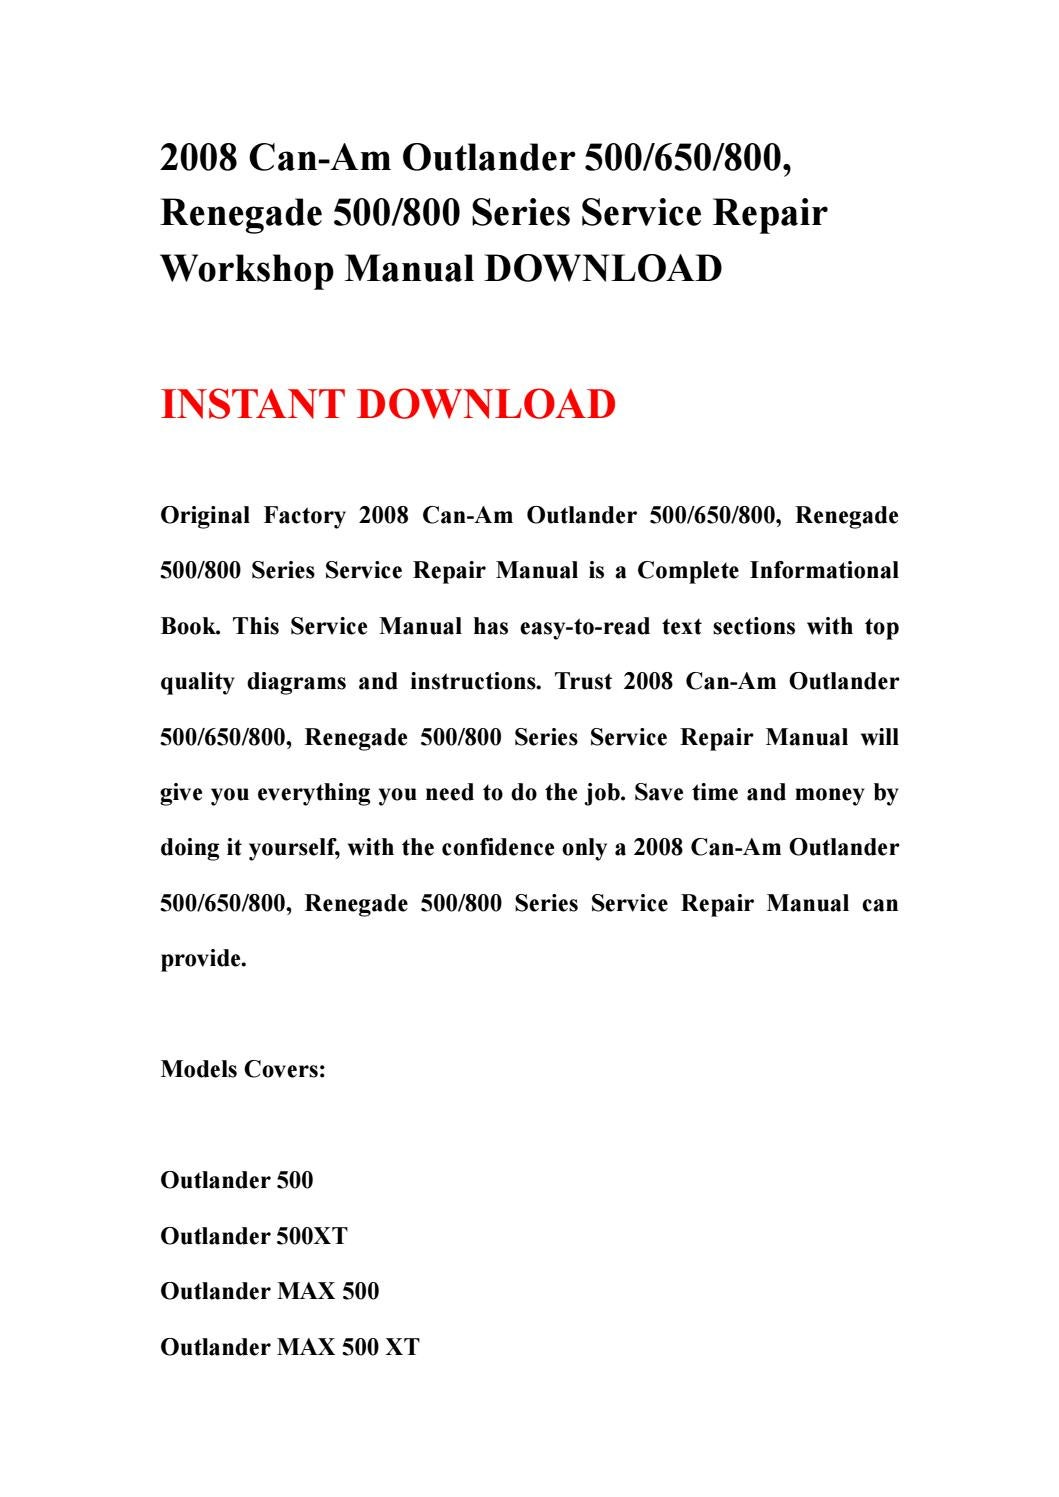 hight resolution of 2008 can am outlander 500650800 renegade 500800 series service repair workshop manual download by ksjefhsnef issuu